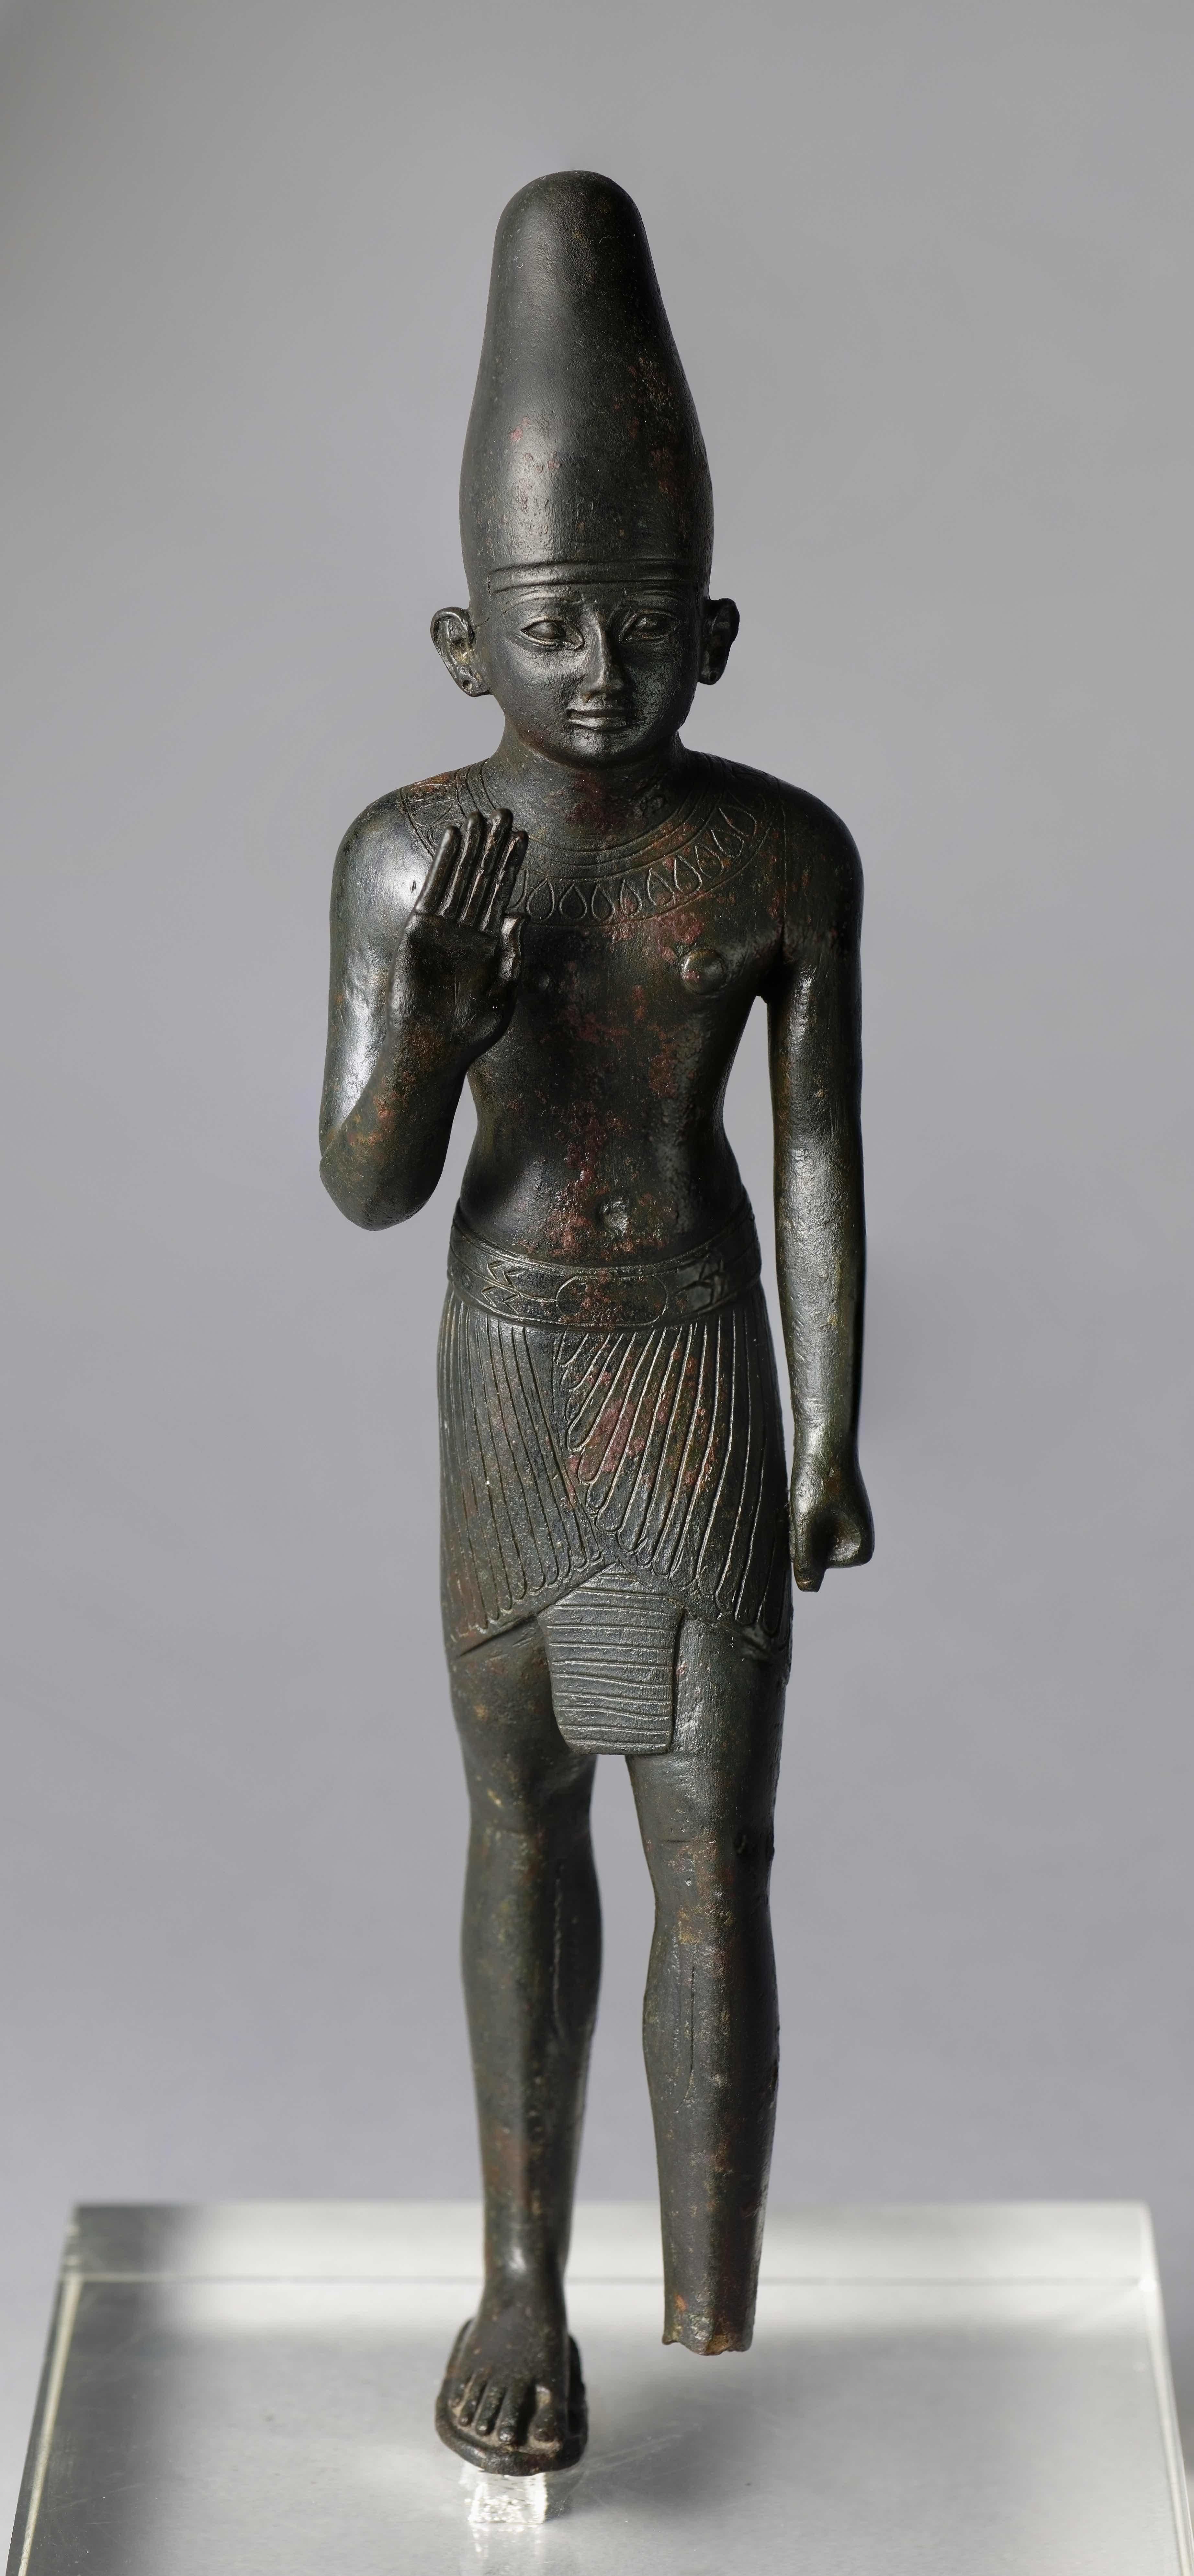 d958-new-phoenician-figure-cor-cropped_baja